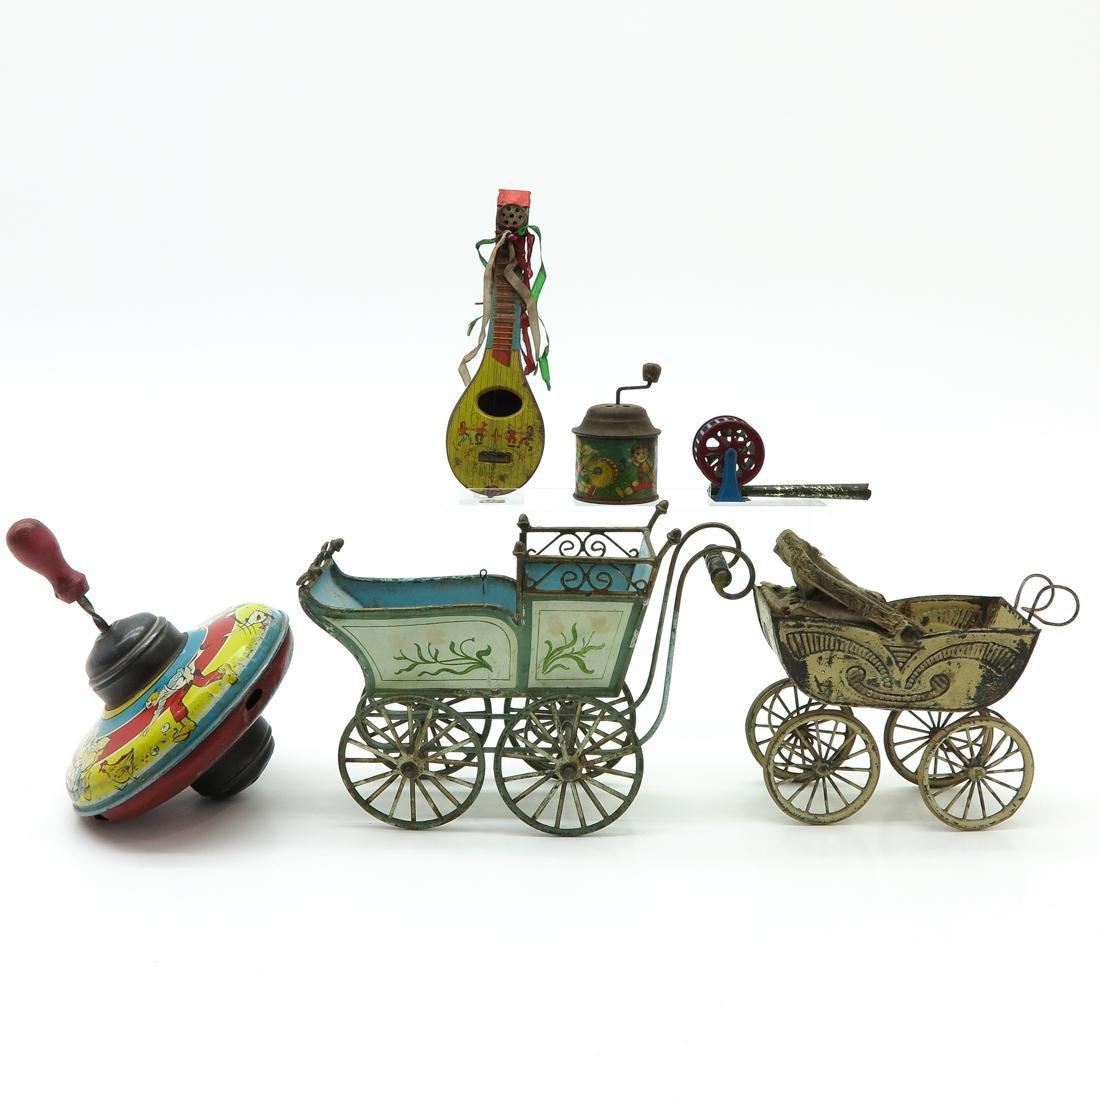 Diverse Lot of 6 Vintage Toys